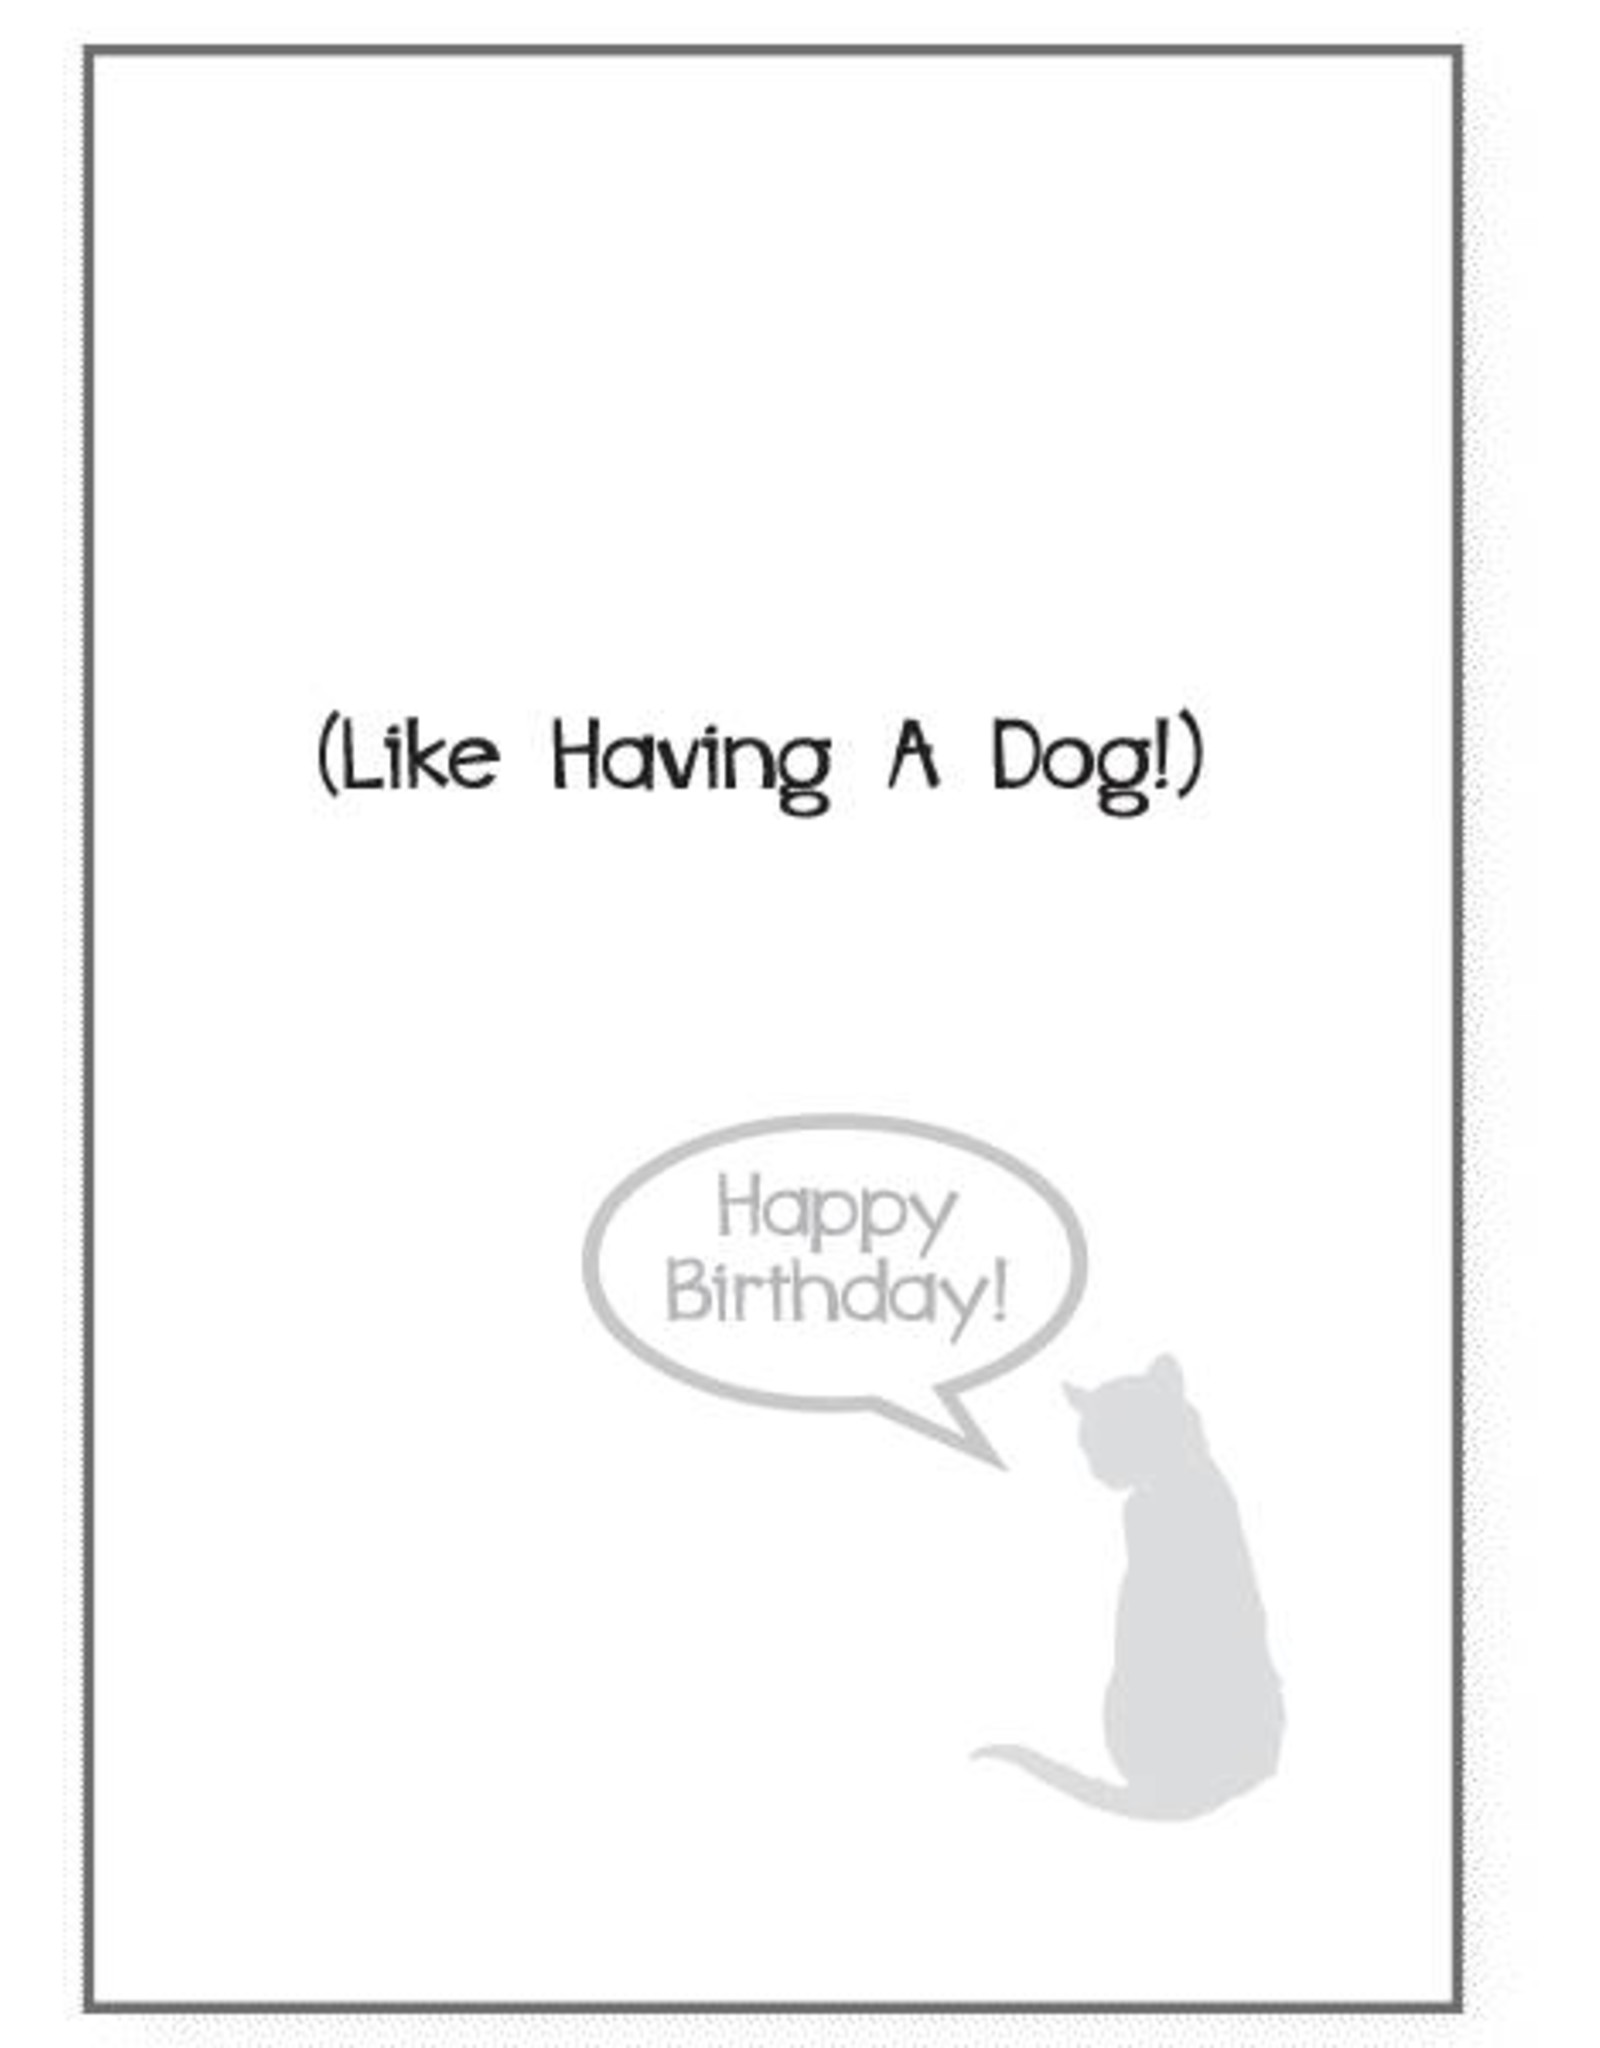 Dog Speak Dog Speak Card - Birthday - There Are Worse Things